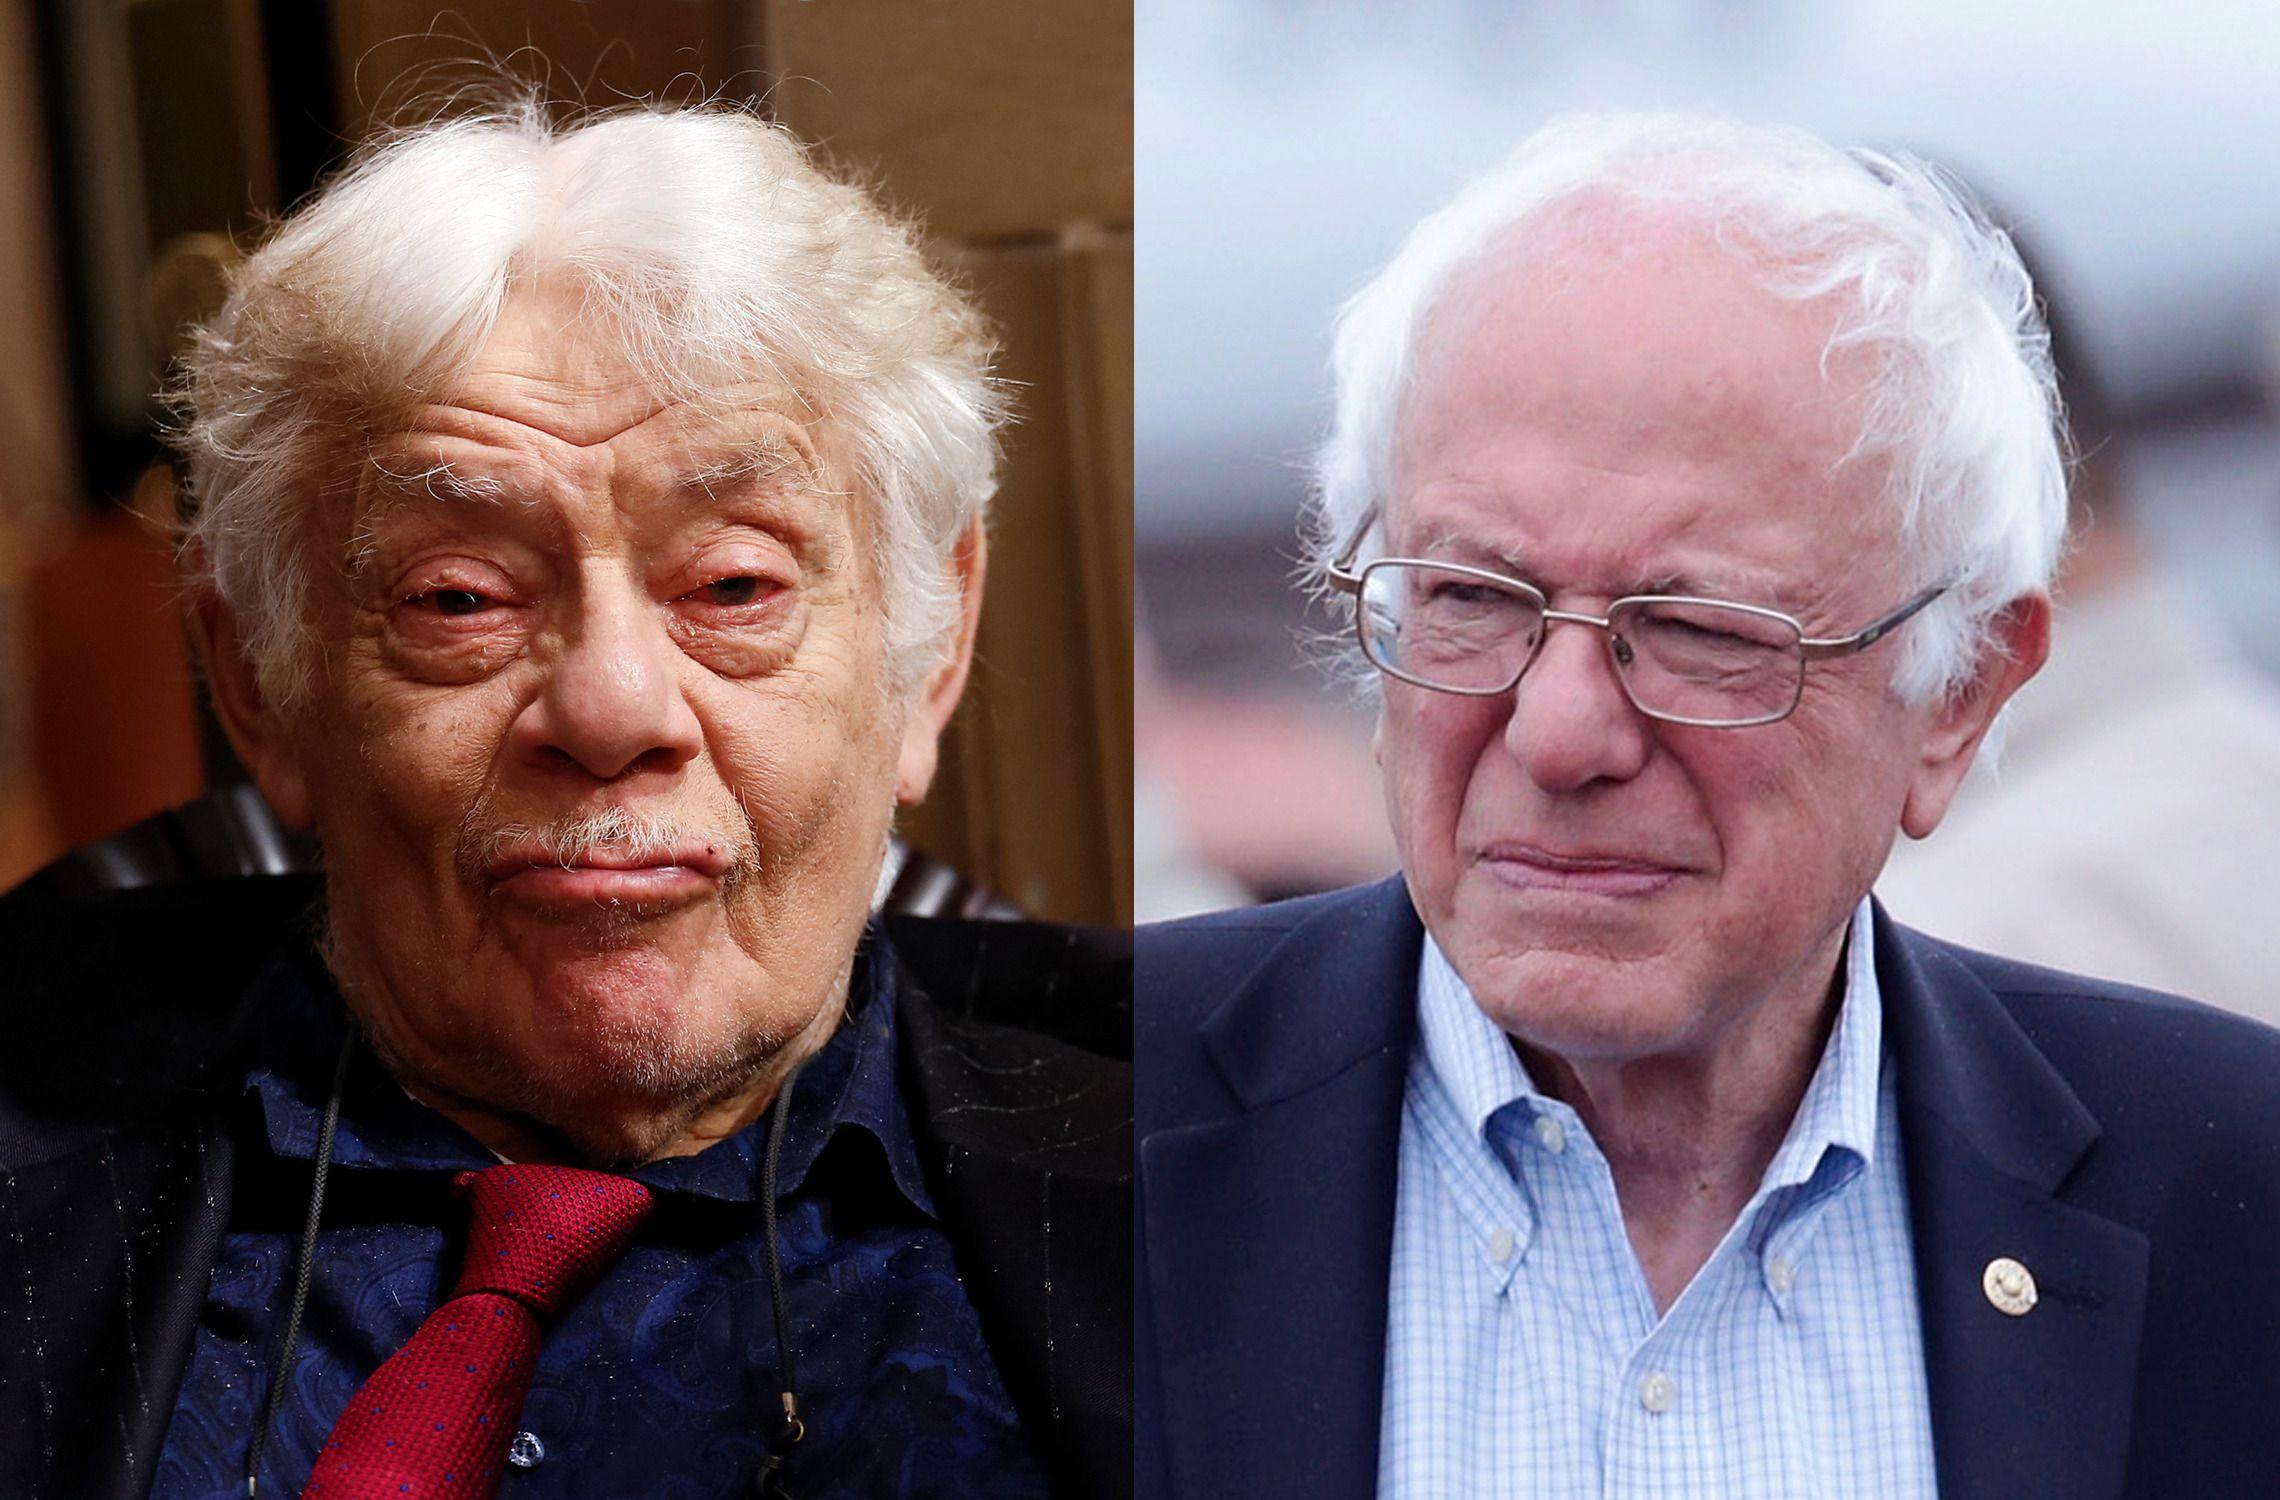 Grumpy Old Men: Jerry Stiller turned 89 on June 7, Bernie Sanders is 74, but both wear their alter kaker-dom with pride.